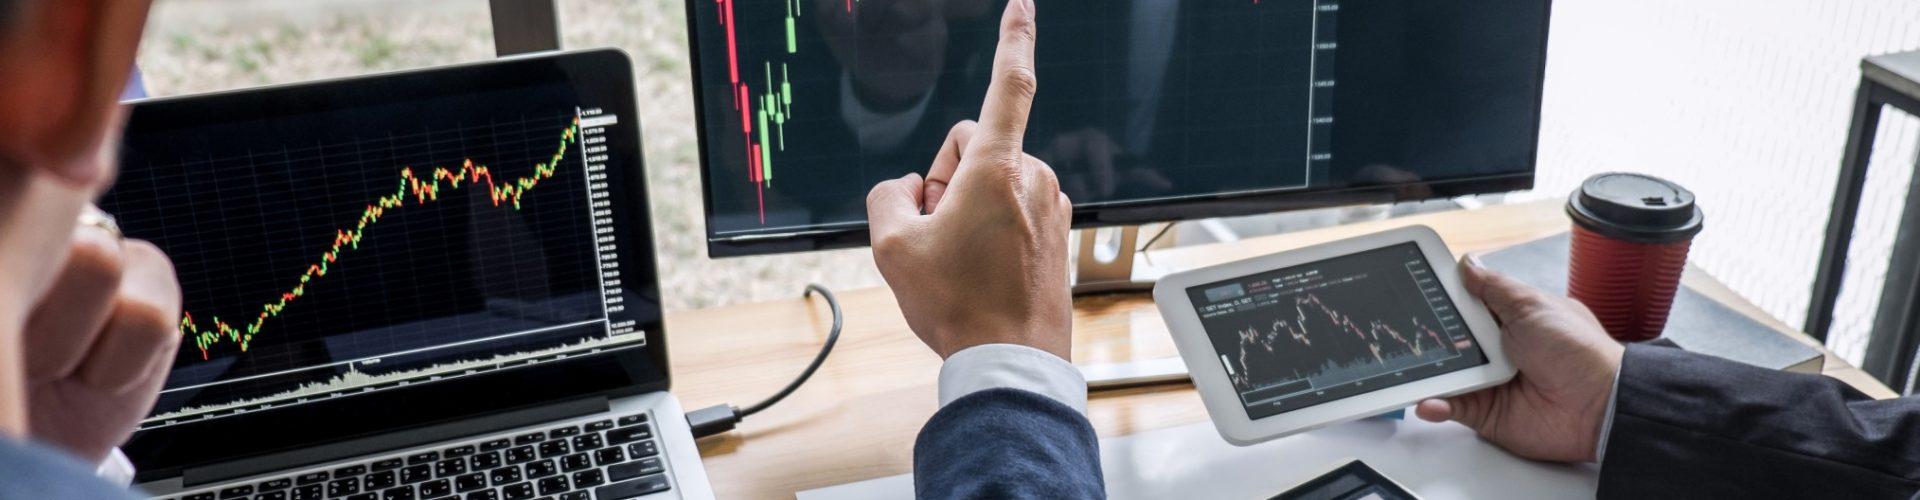 Pourquoi trader le Forex avec Saxo Banque ?